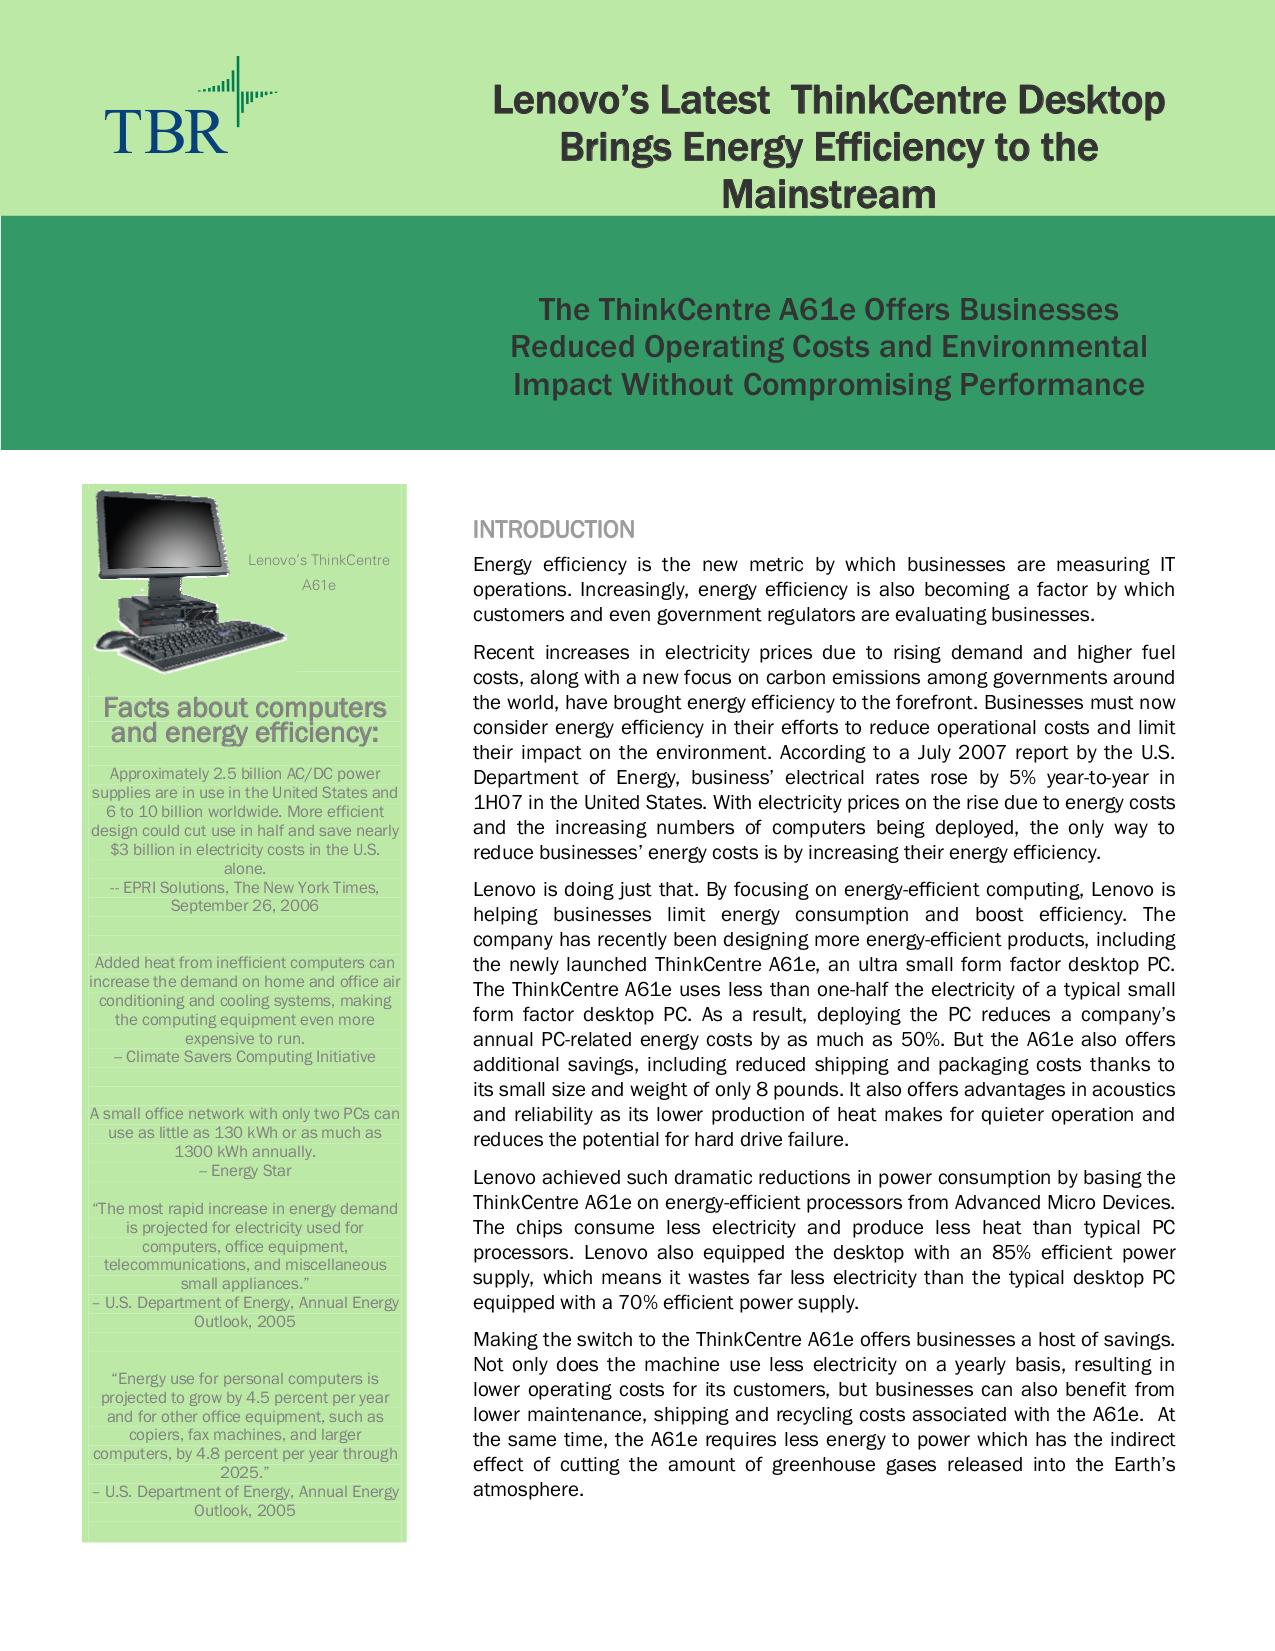 pdf for Lenovo Desktop ThinkCentre A61 9189 manual